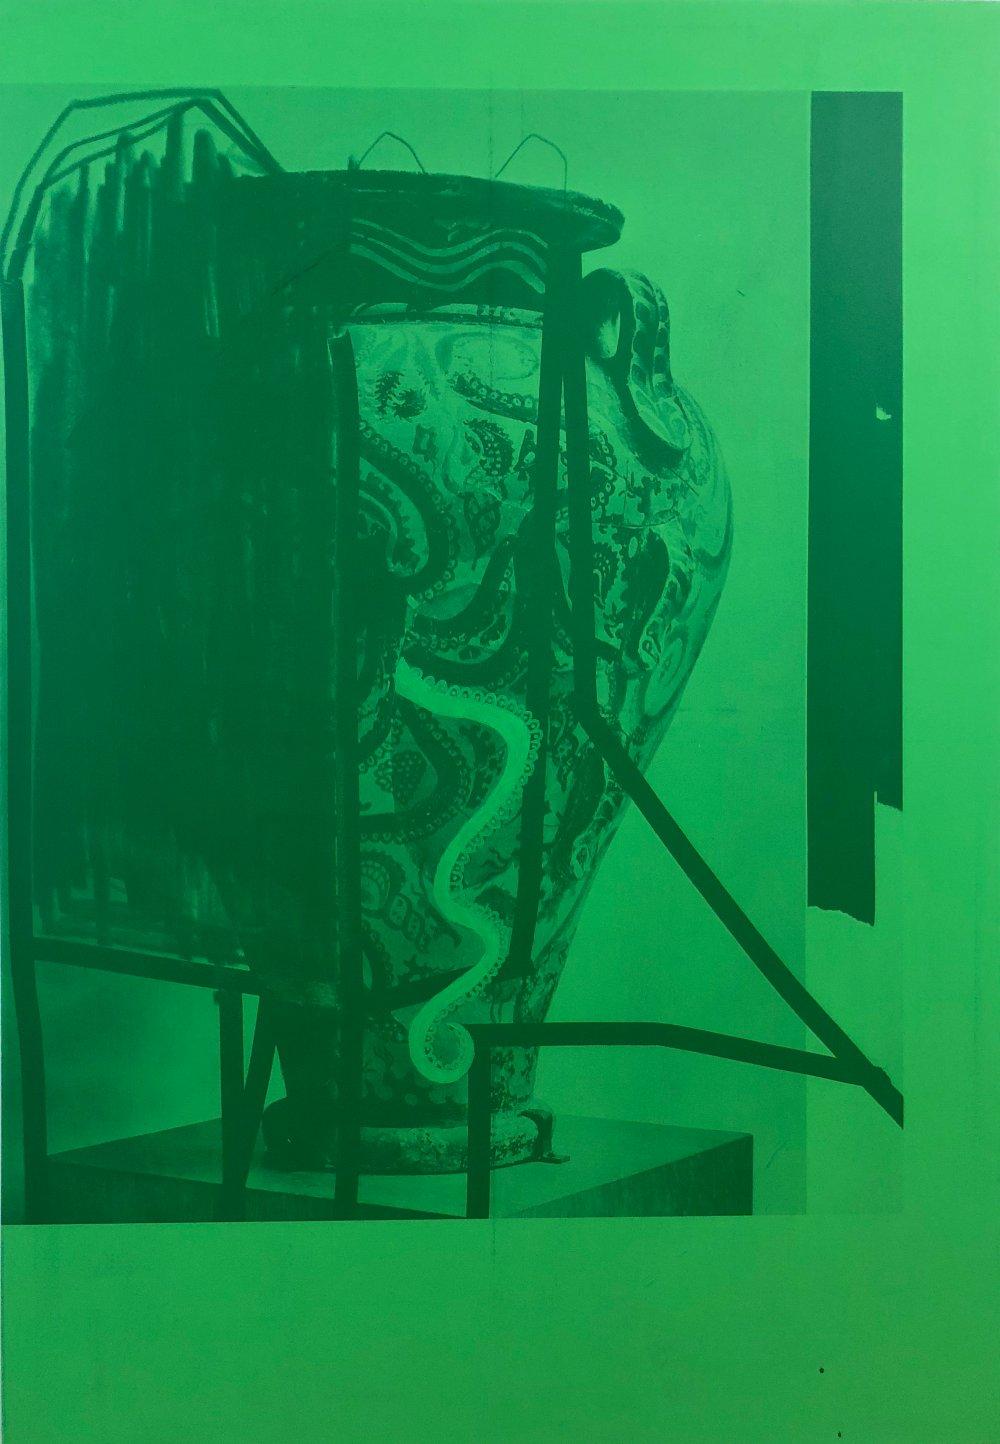 Curse Me Cthuluh 2008 (Green)